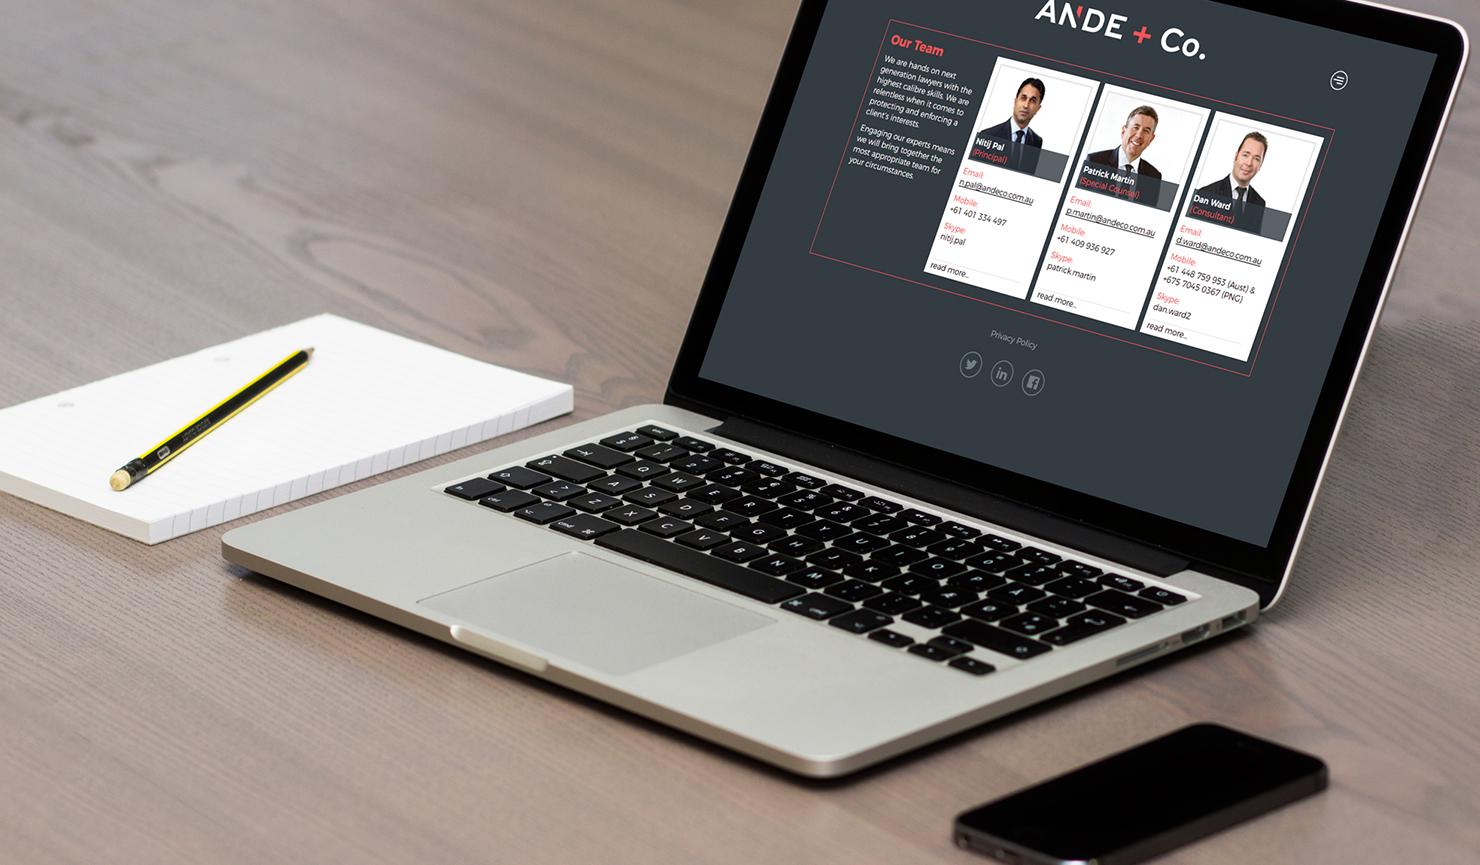 ande-co-website-01